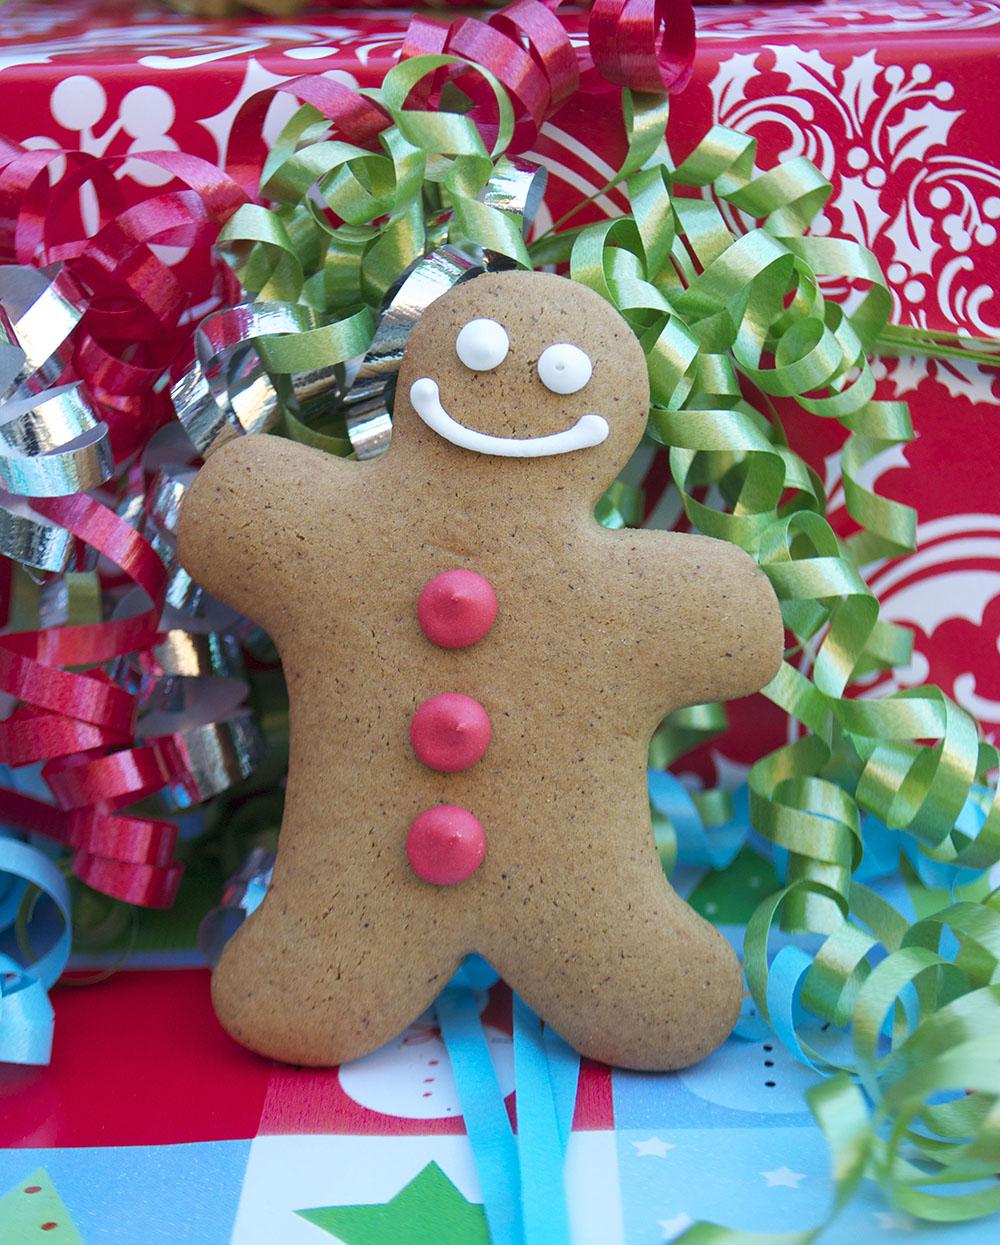 Bake Sale Toronto Christmas Holiday Gingerbread Man Person Facebook.jpg